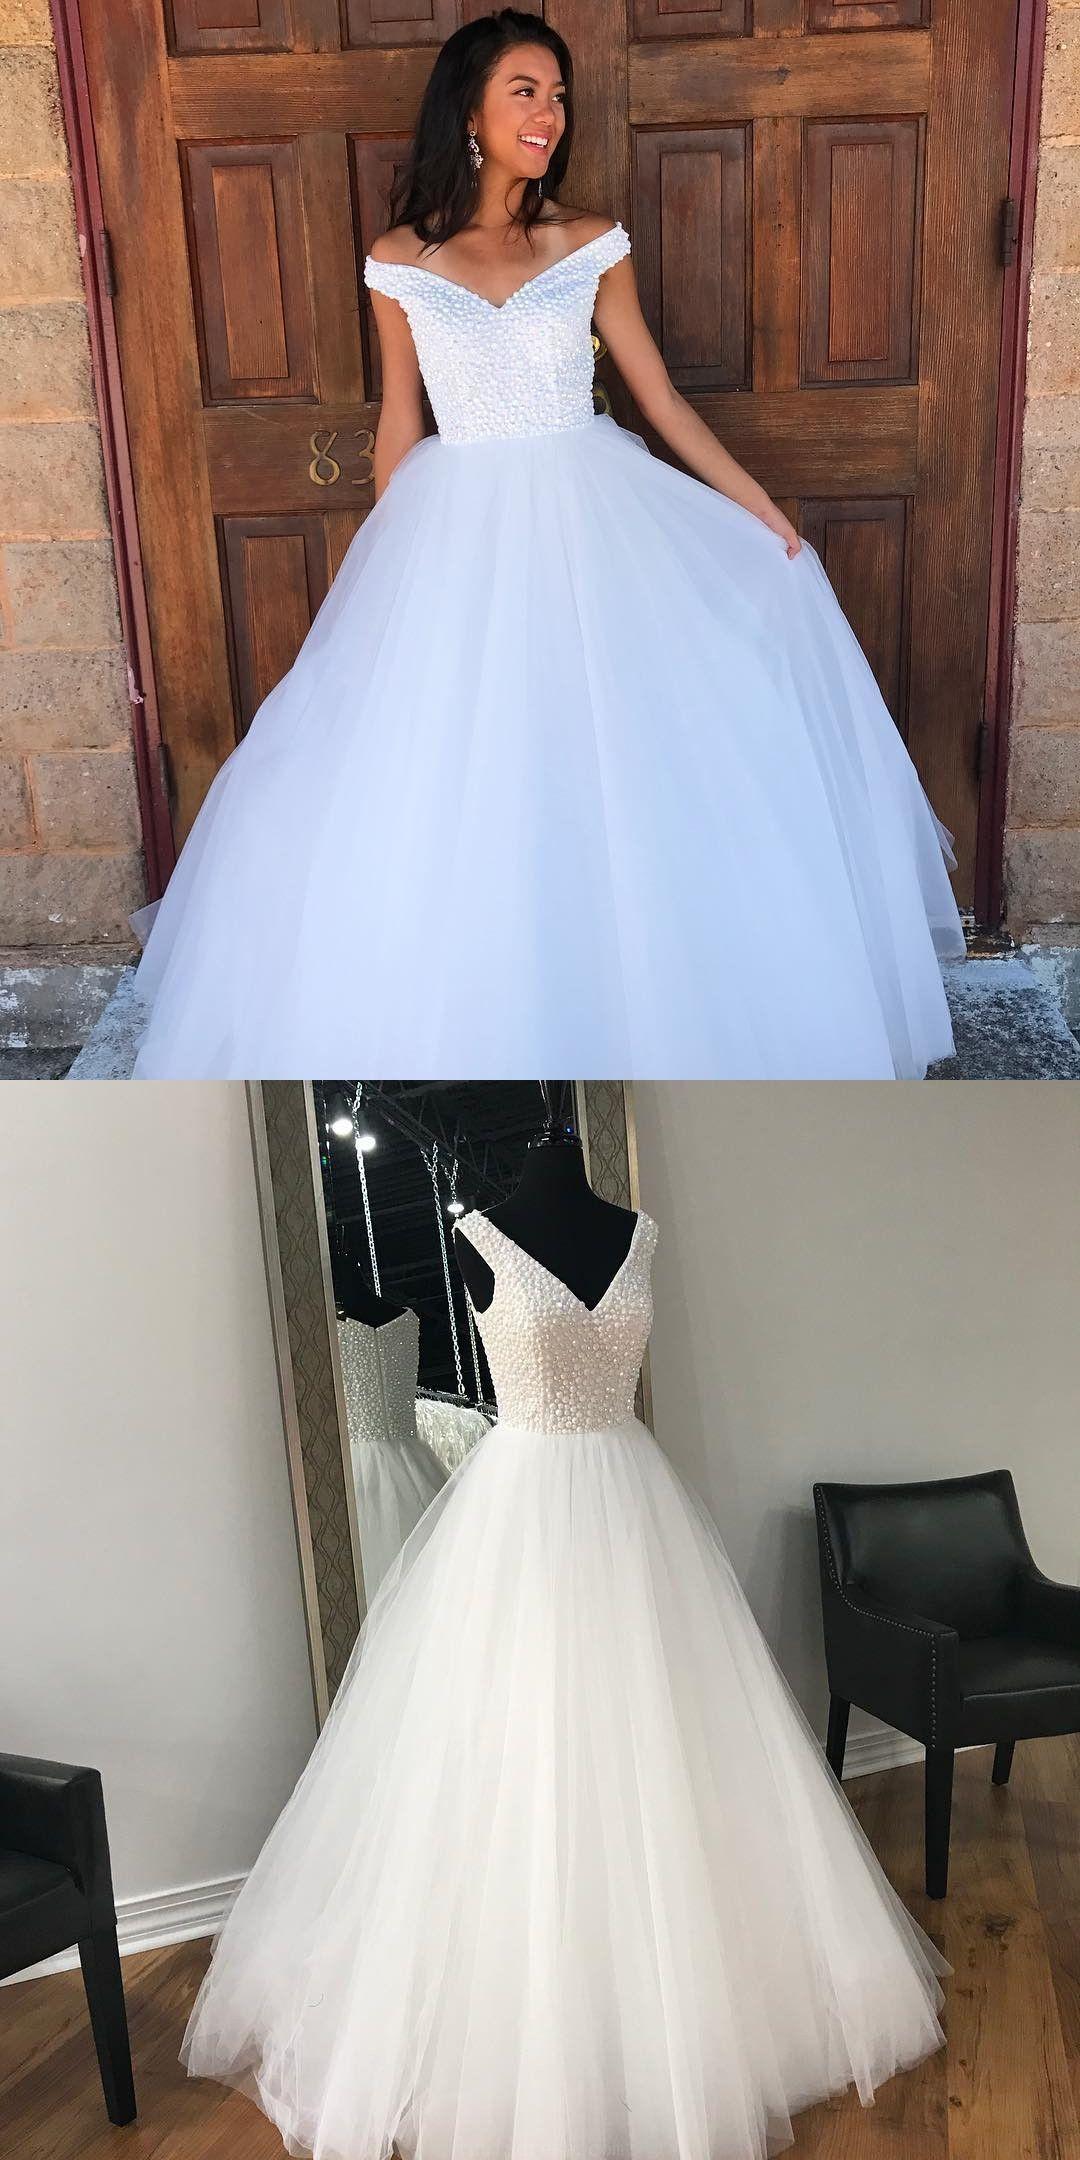 e80ff3f4e29 Discount Popular Prom Dresses 2019 Elegant V Neck Beaded White Long ...